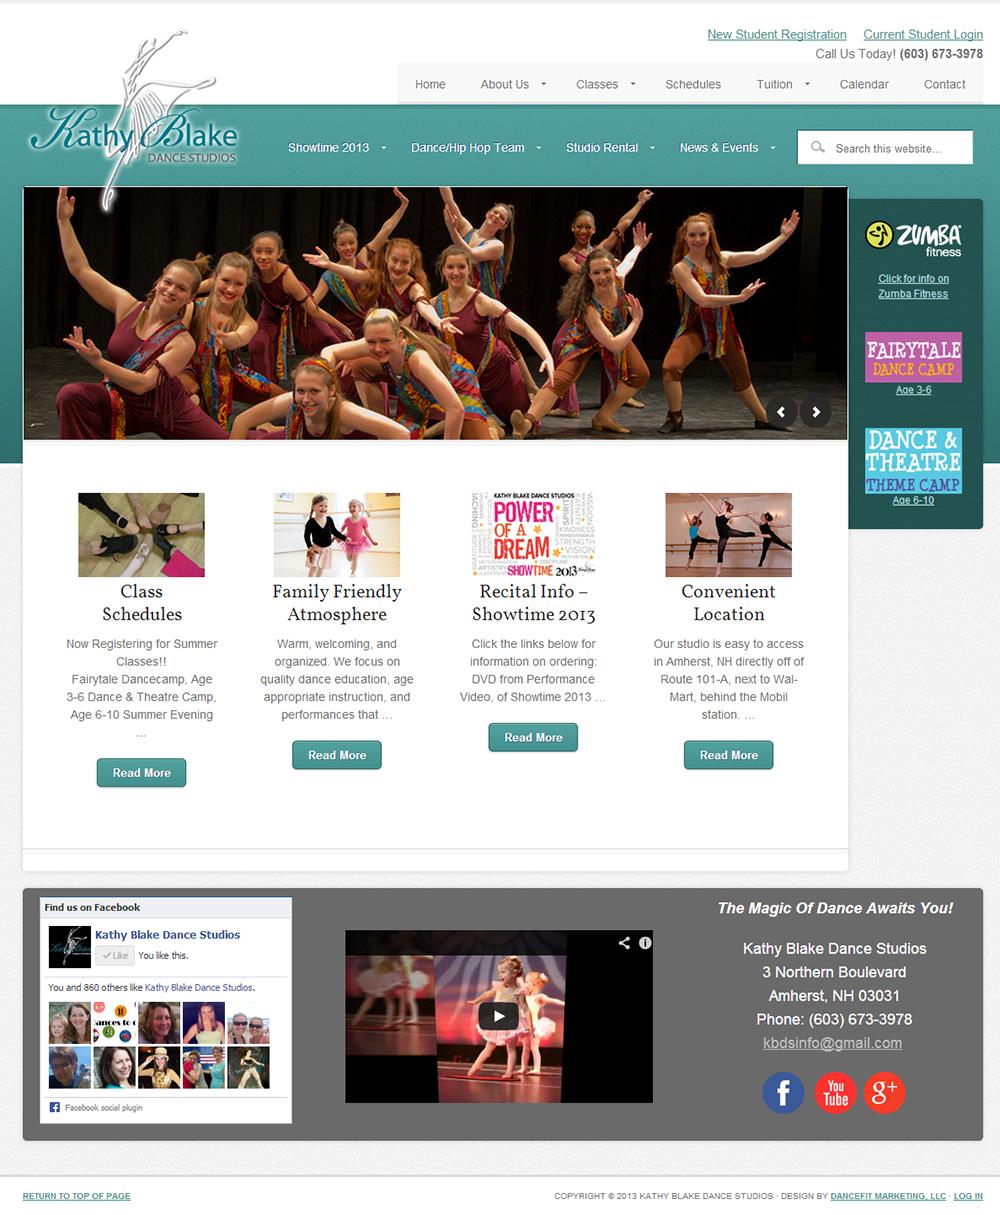 Kathy Blake Dance Studios Website Http Www Kathyblakedancestudios Com Dance Studio Dance Camp Dance